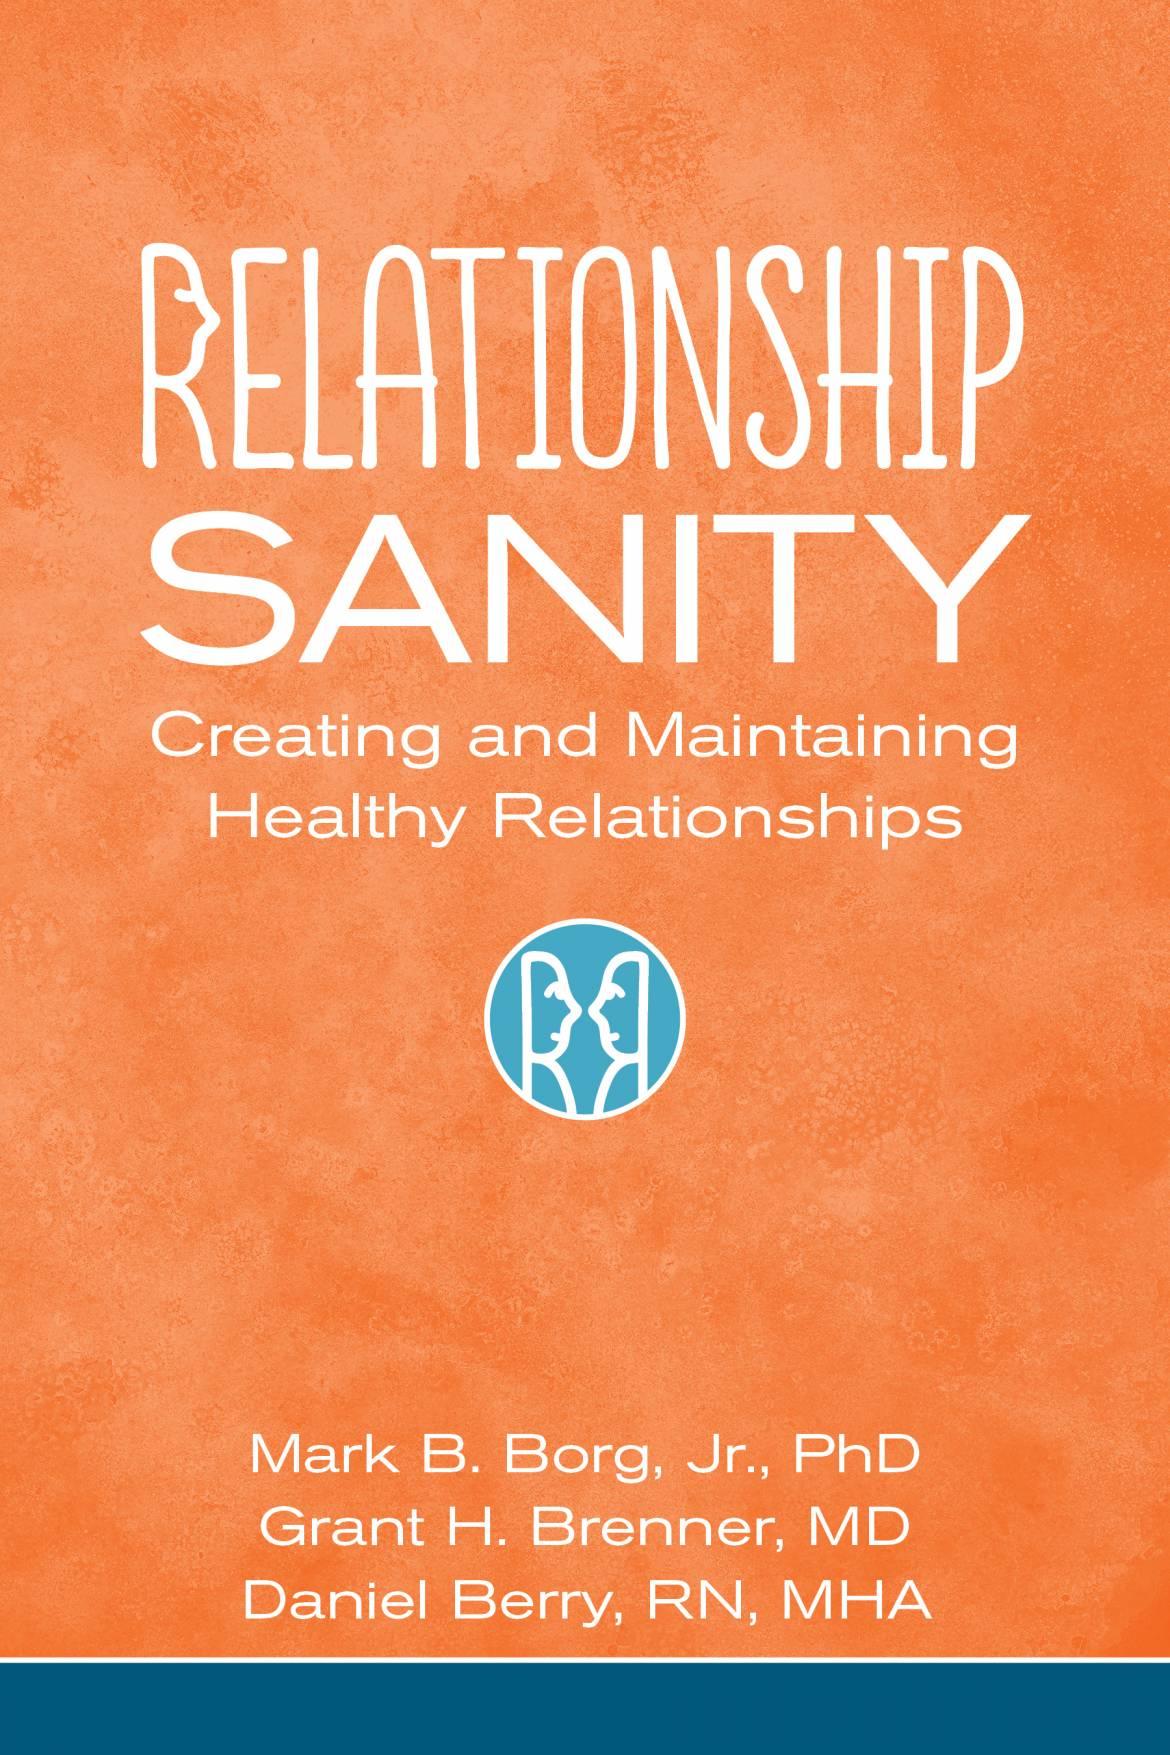 relationshipsanity.jpg